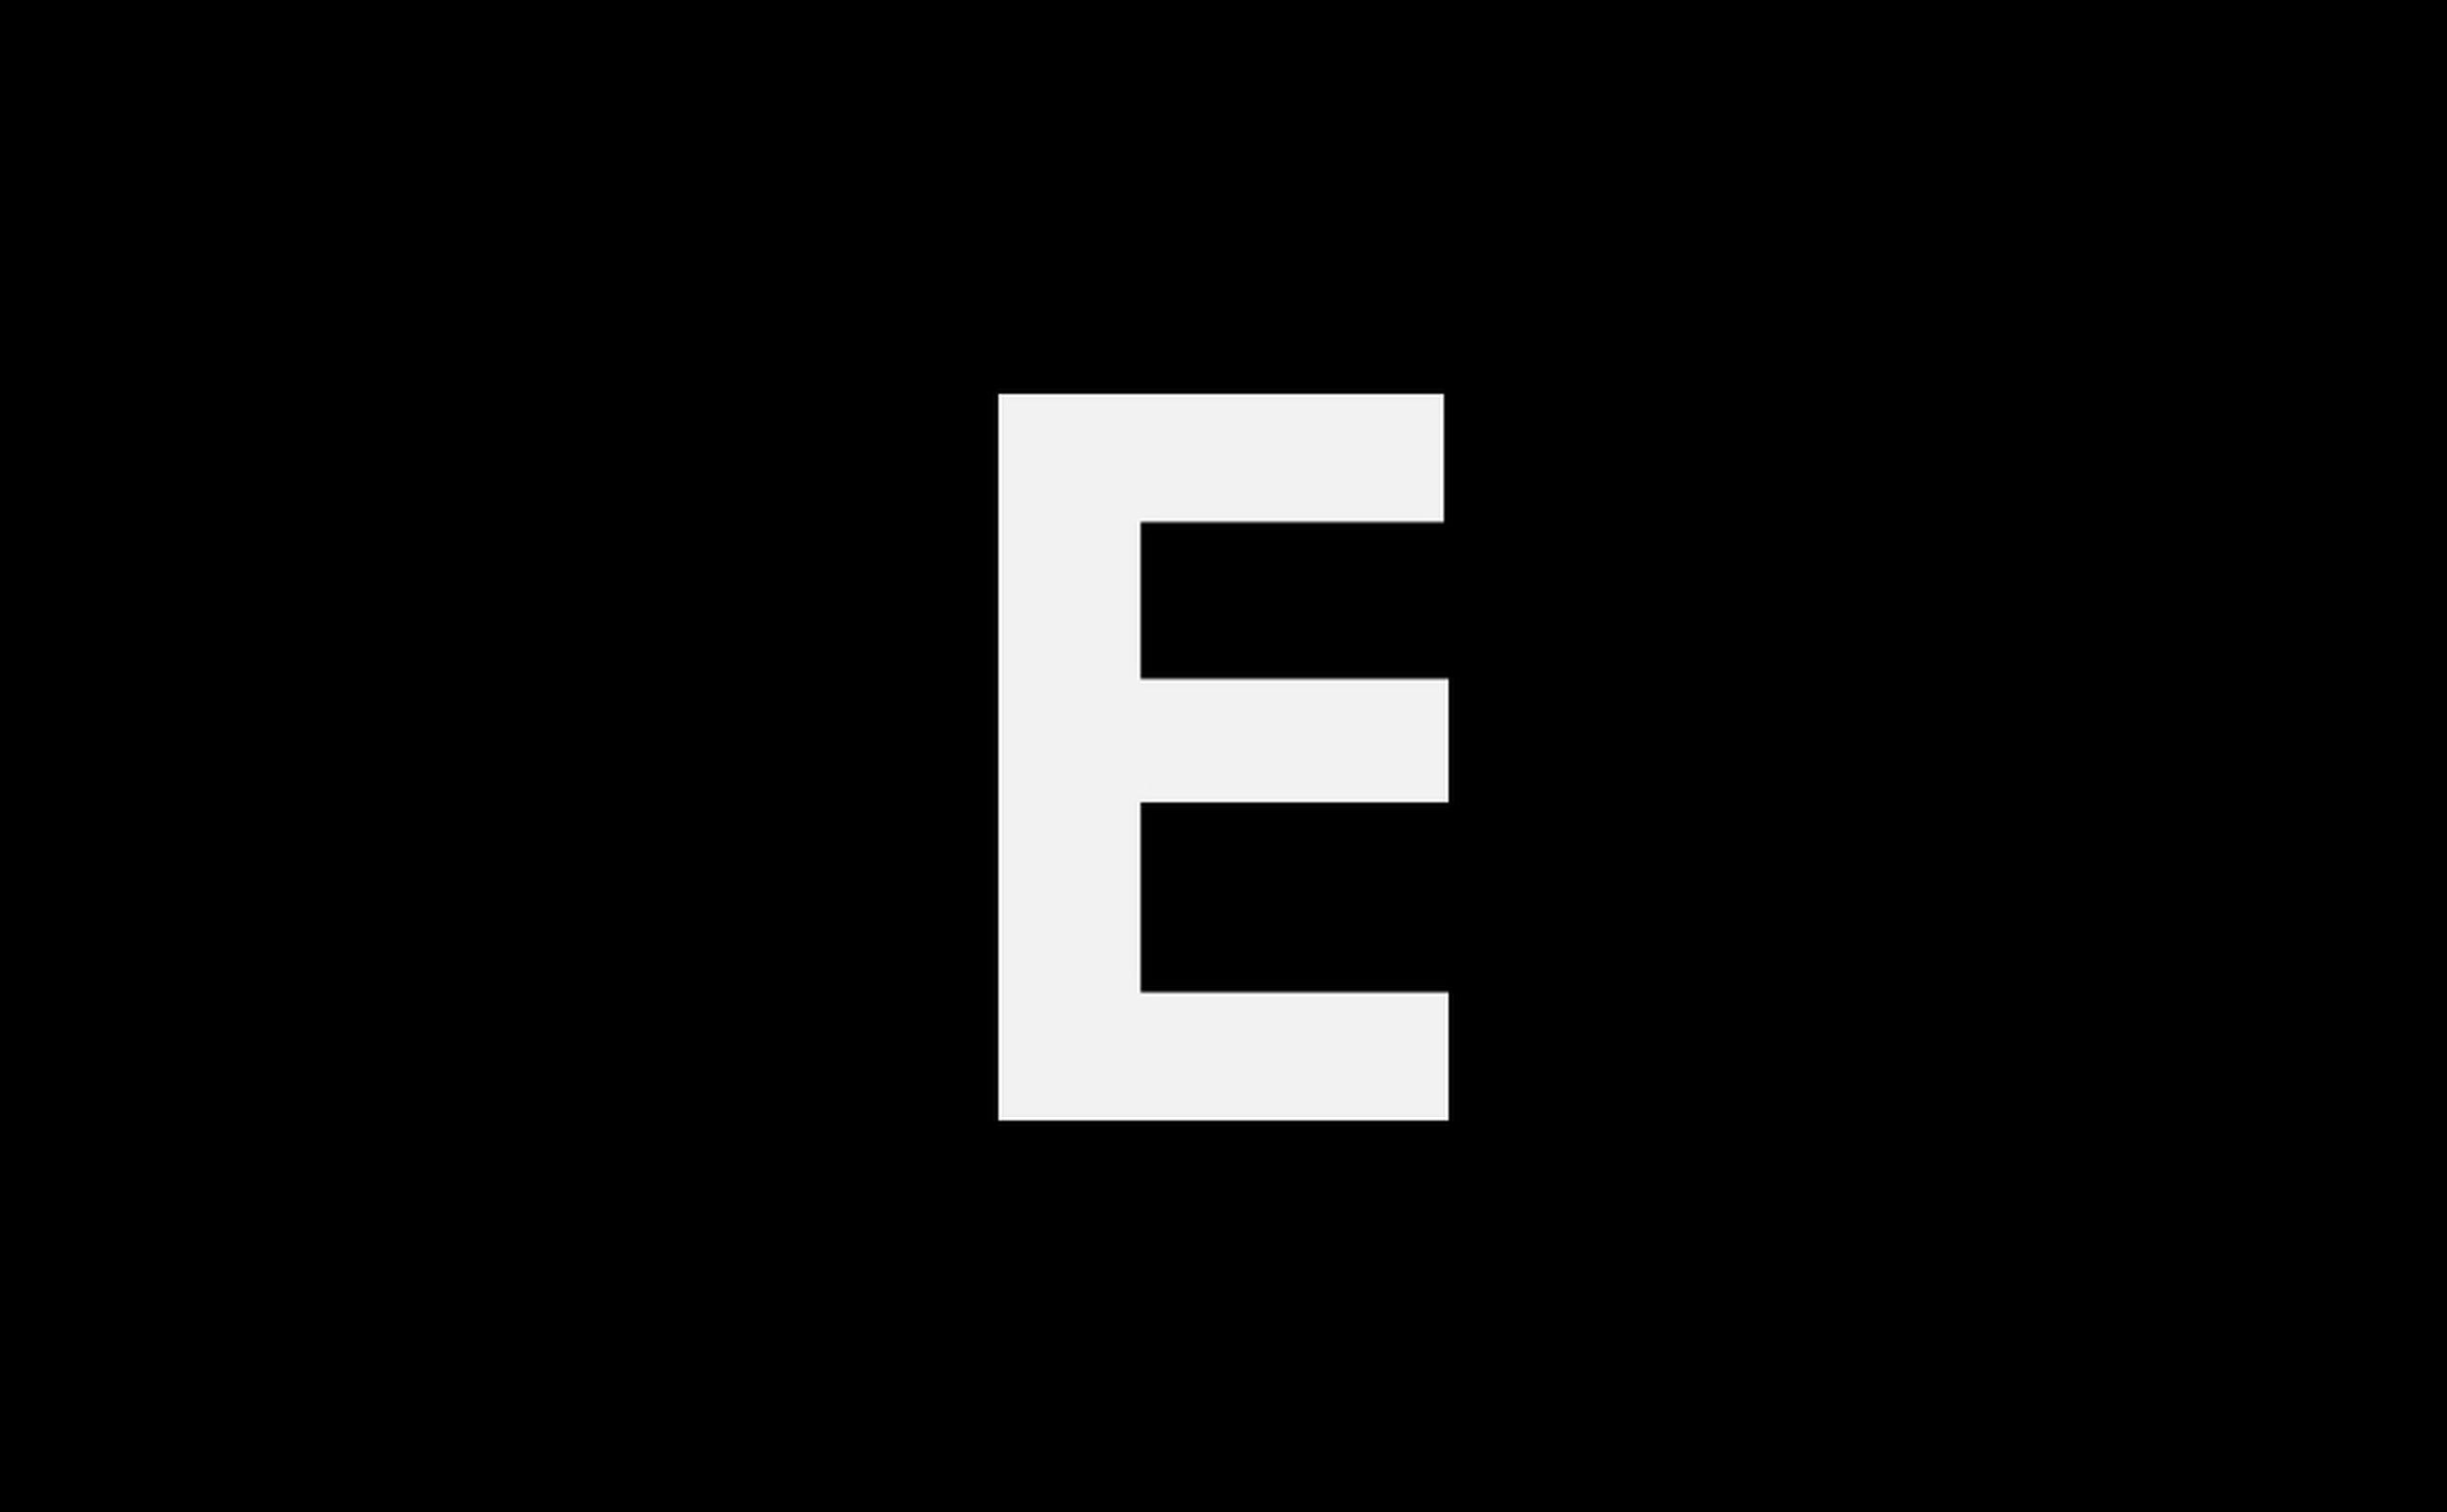 GRAFFITI ON WALL WITH WINDOW